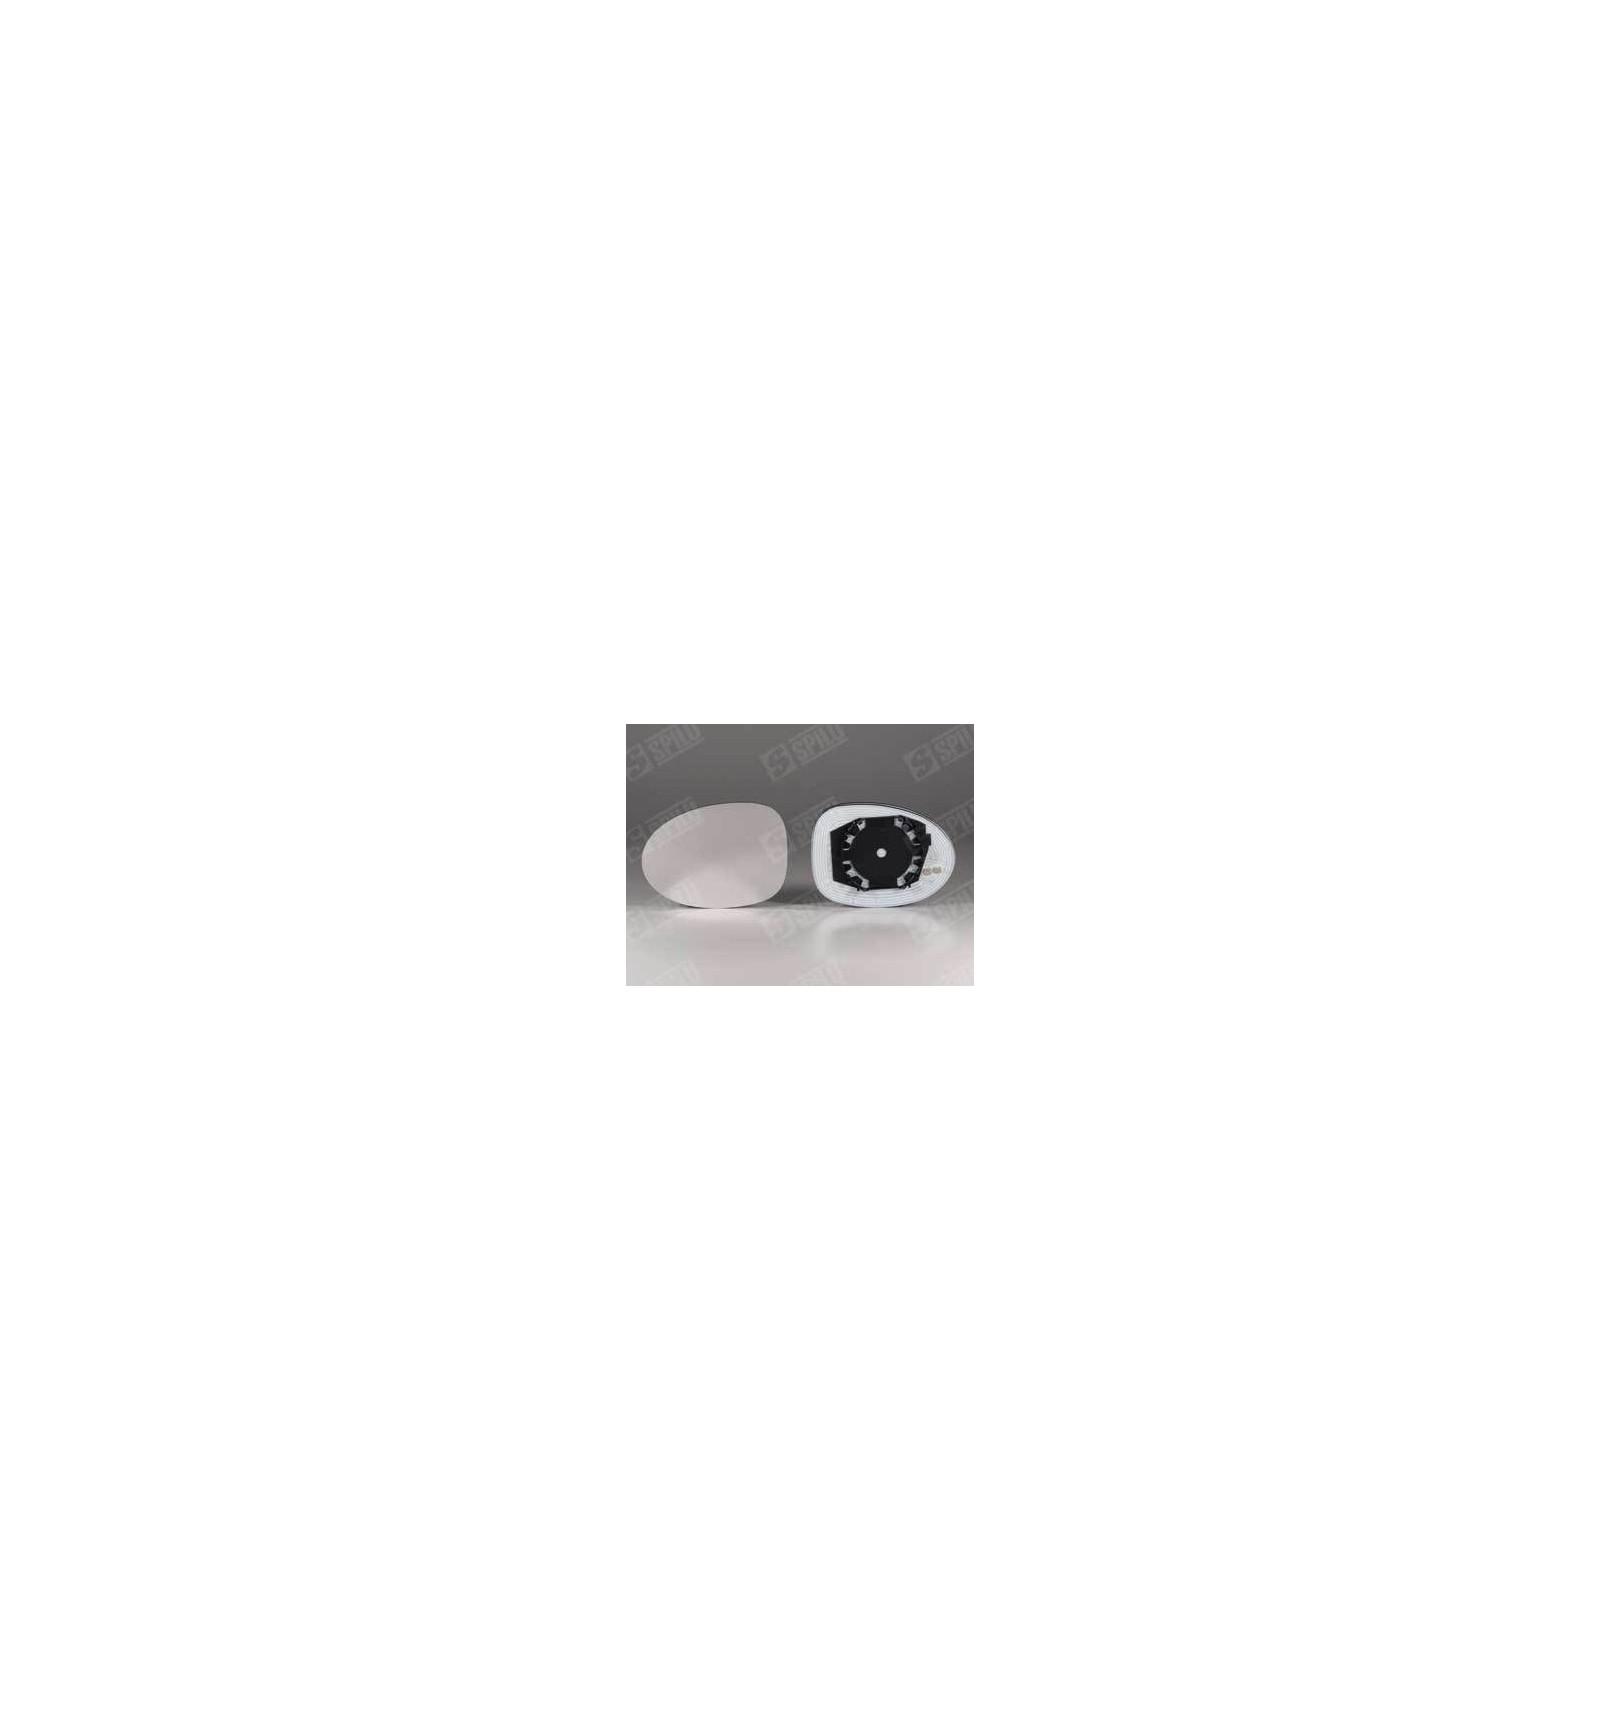 glace de retro gauche support degivrant twingo pas cher. Black Bedroom Furniture Sets. Home Design Ideas